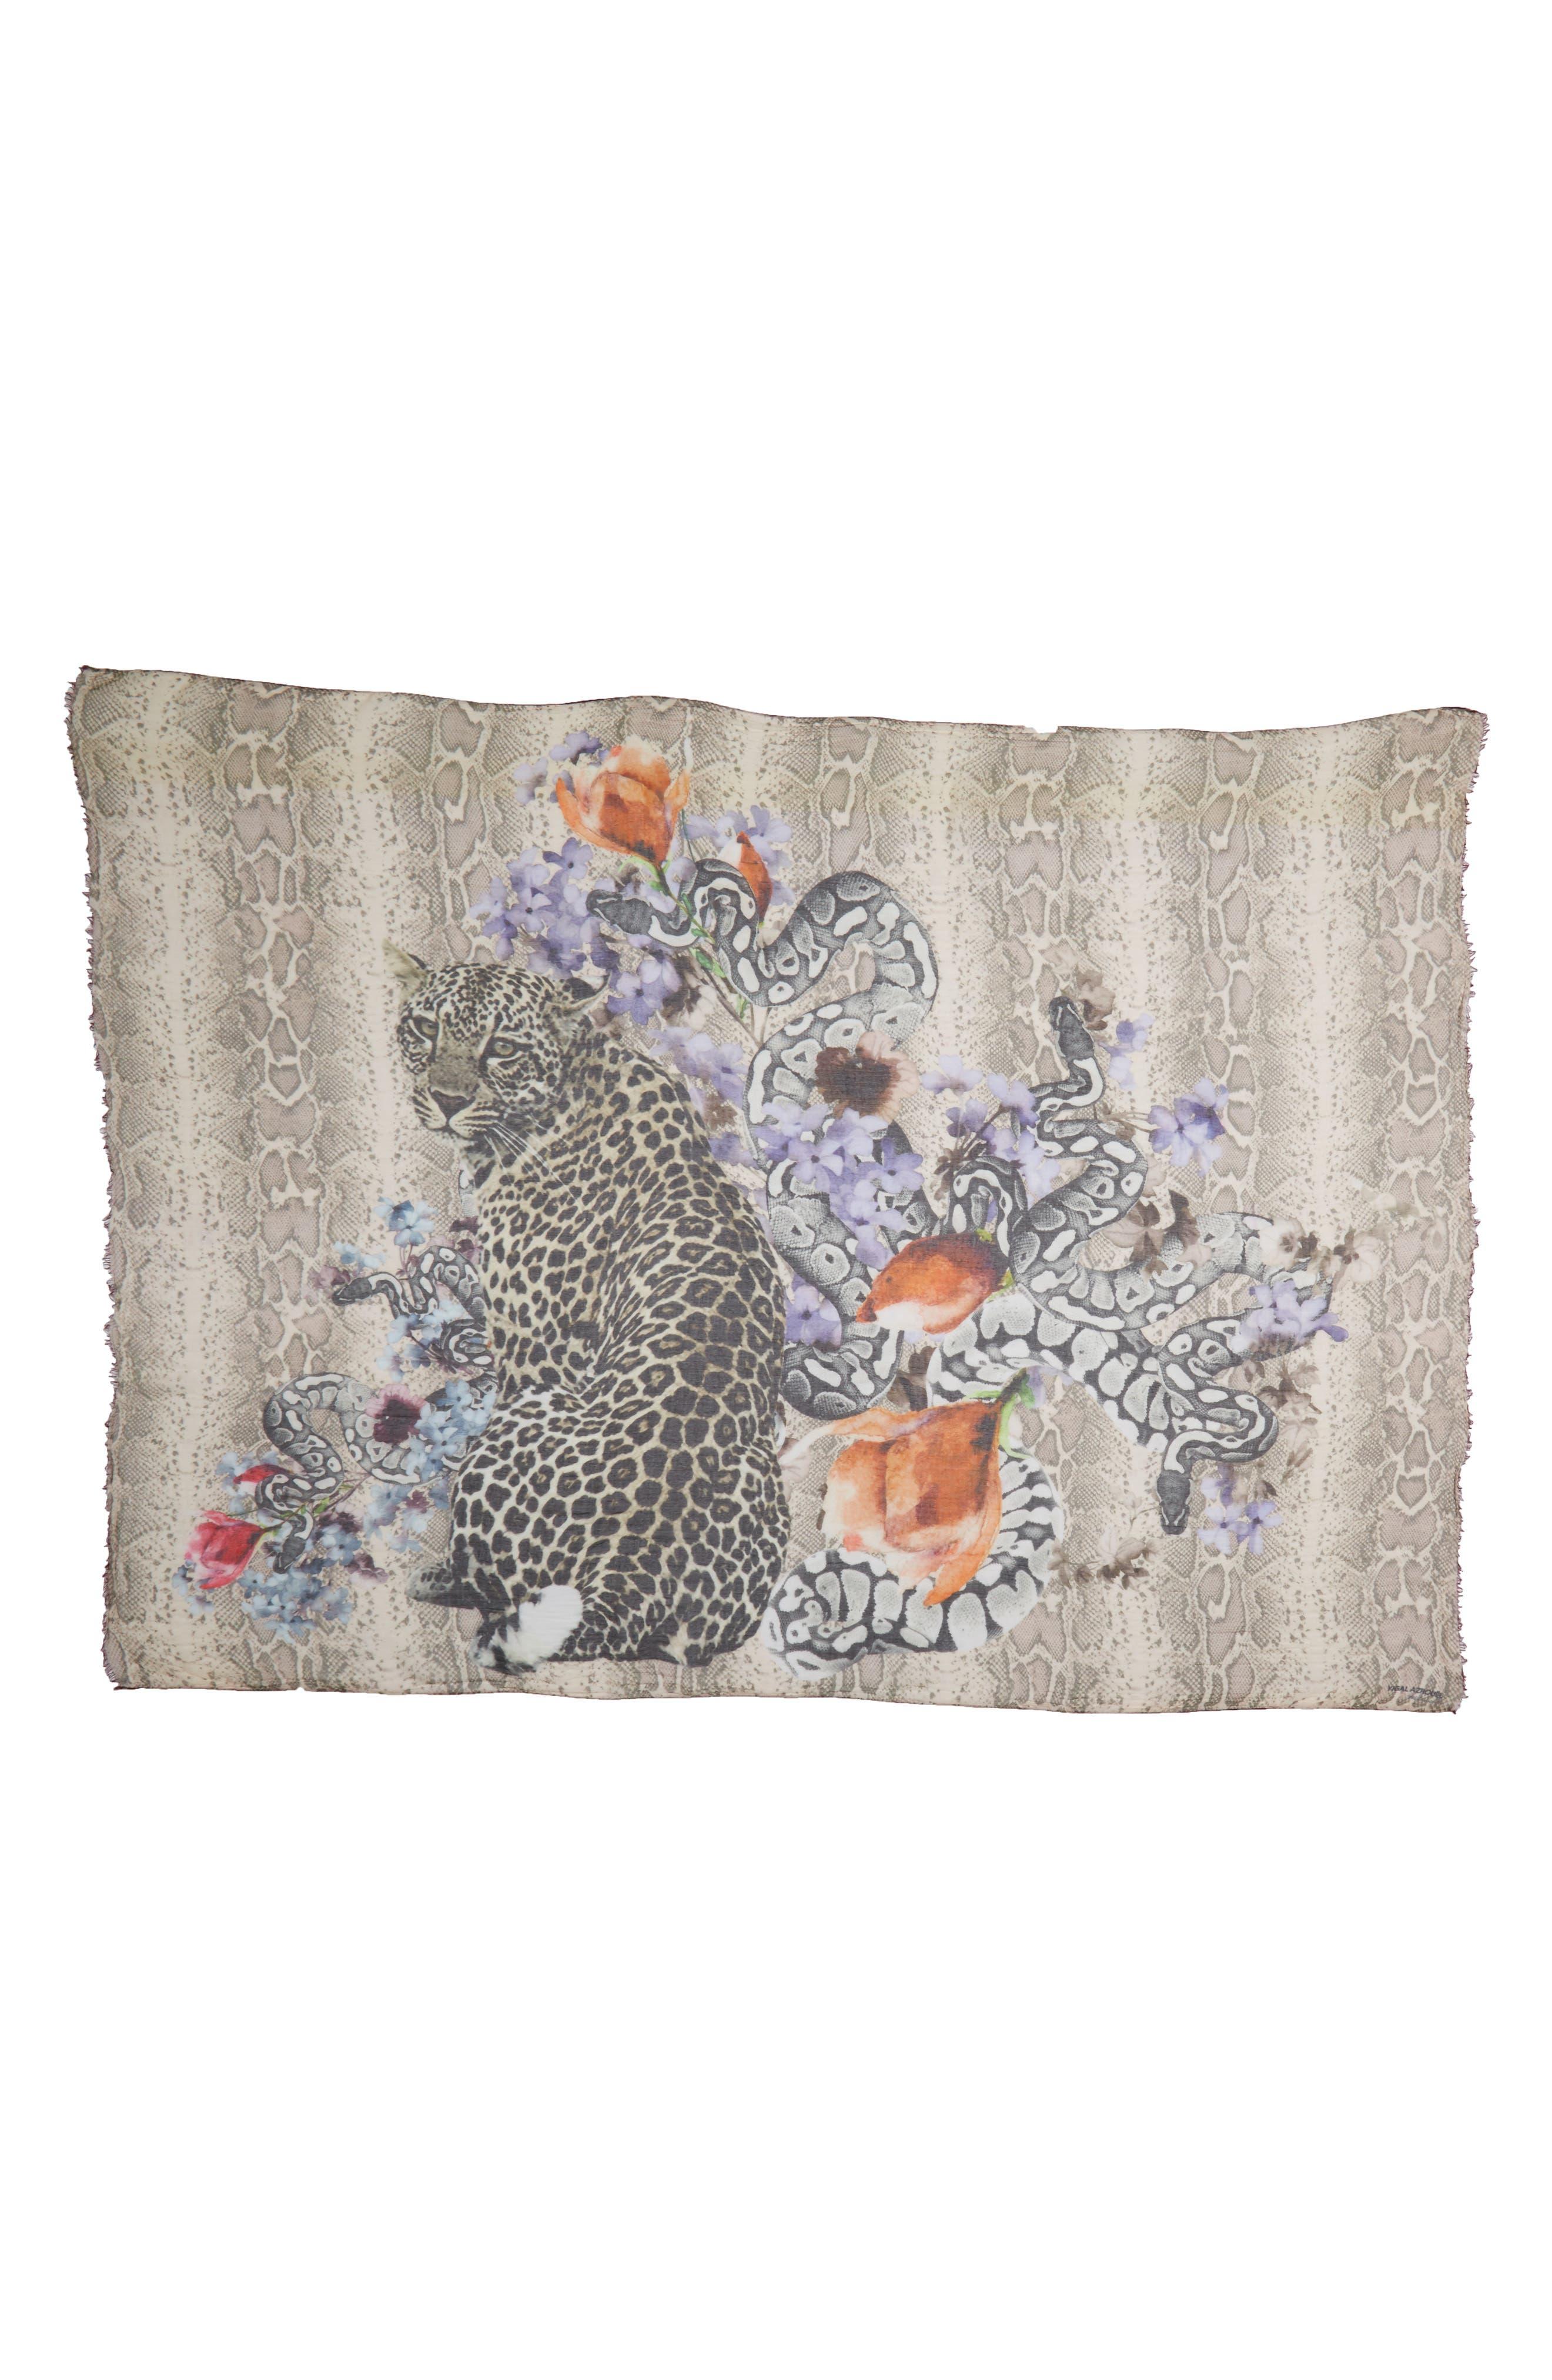 Floral Cheetah Modal & Cashmere Scarf,                         Main,                         color, Sand Multi